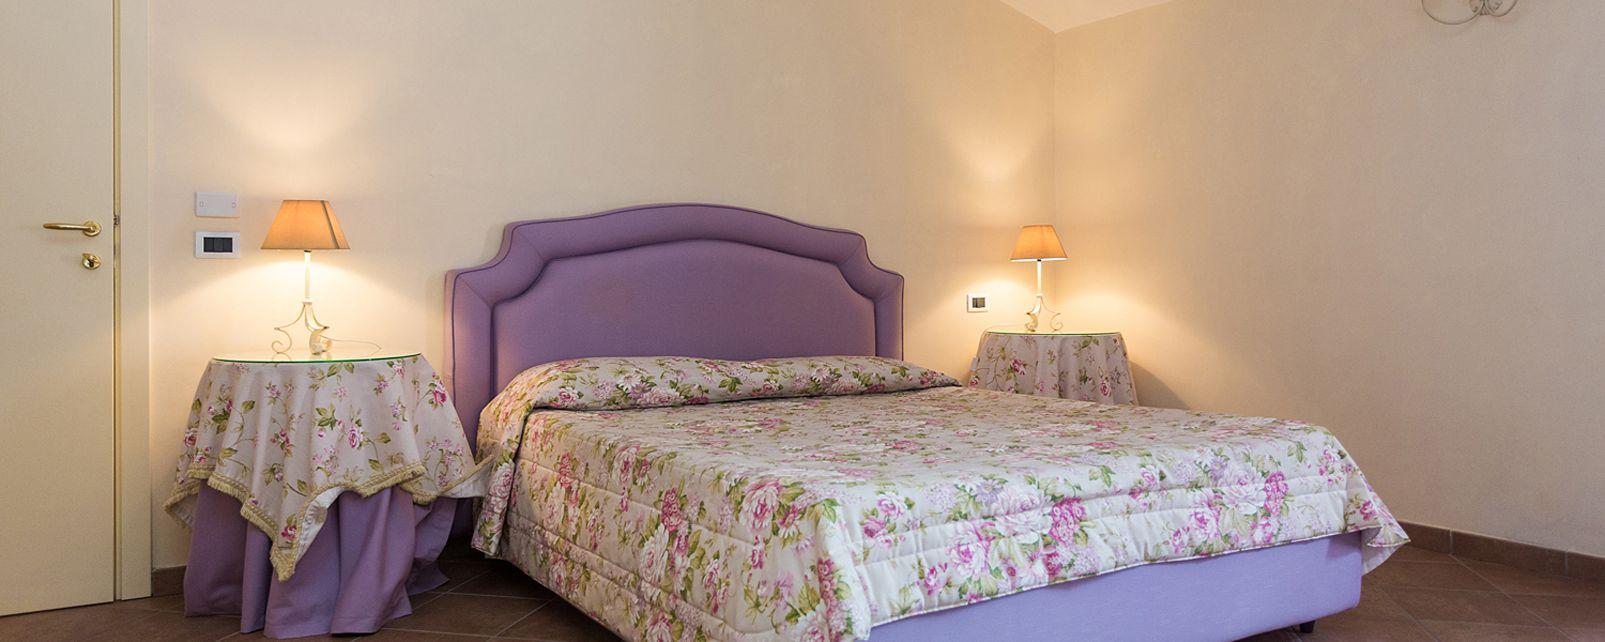 Hotel Borgo Capocasale